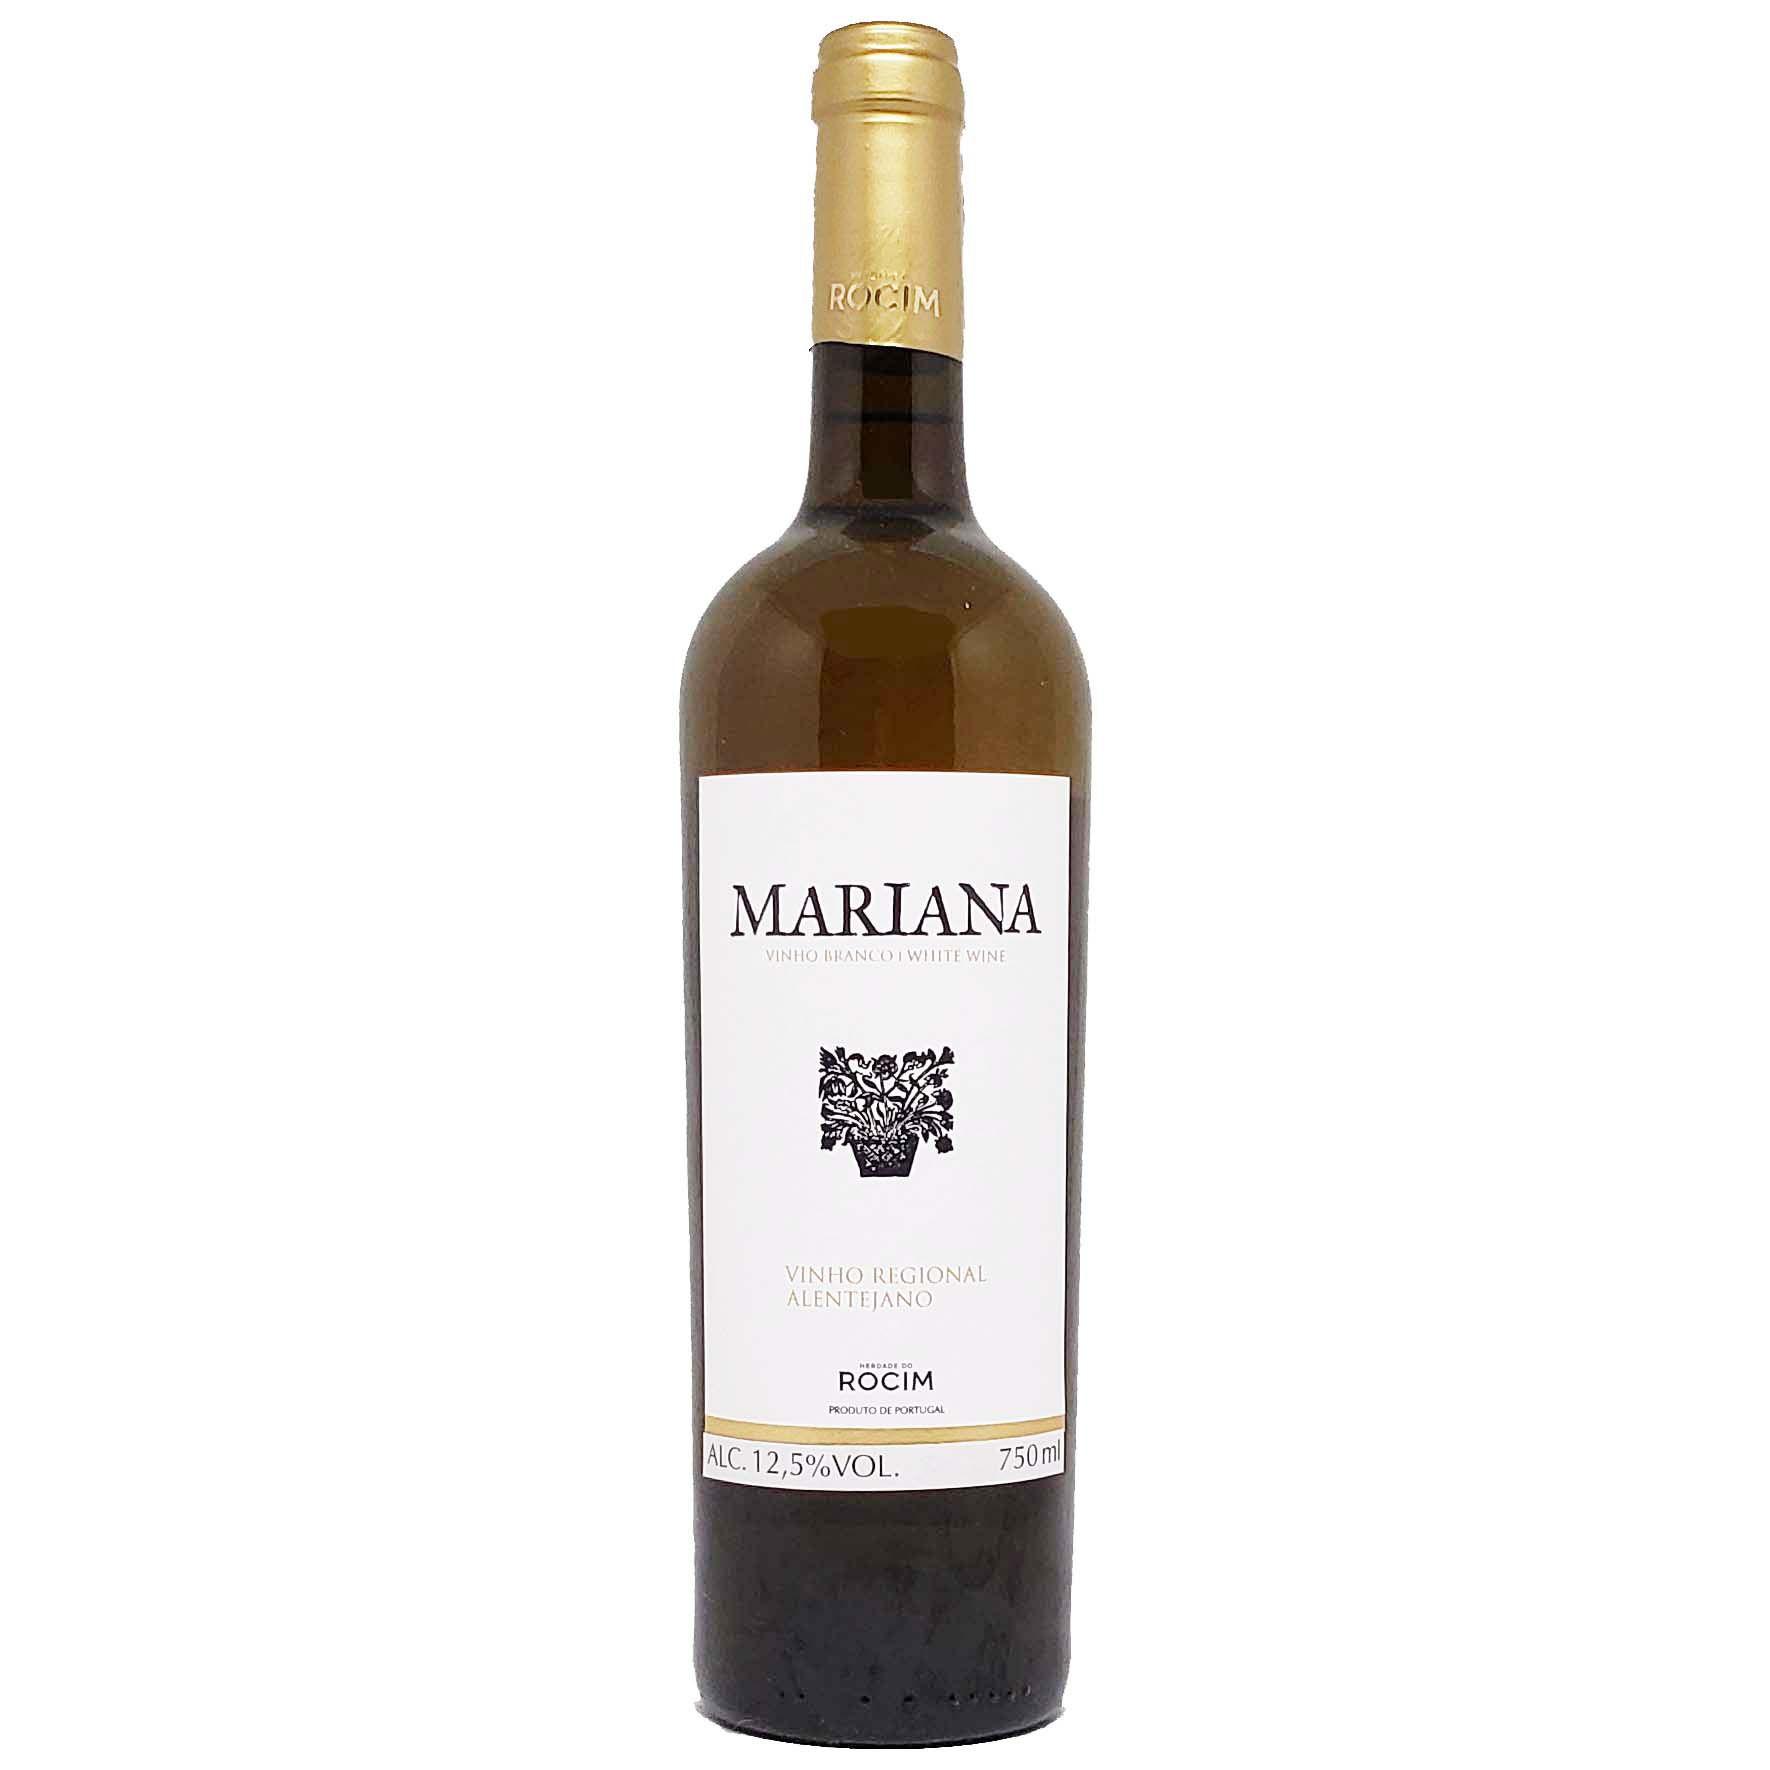 Vinho Branco Mariana Herdade do Rocim - 750ml -